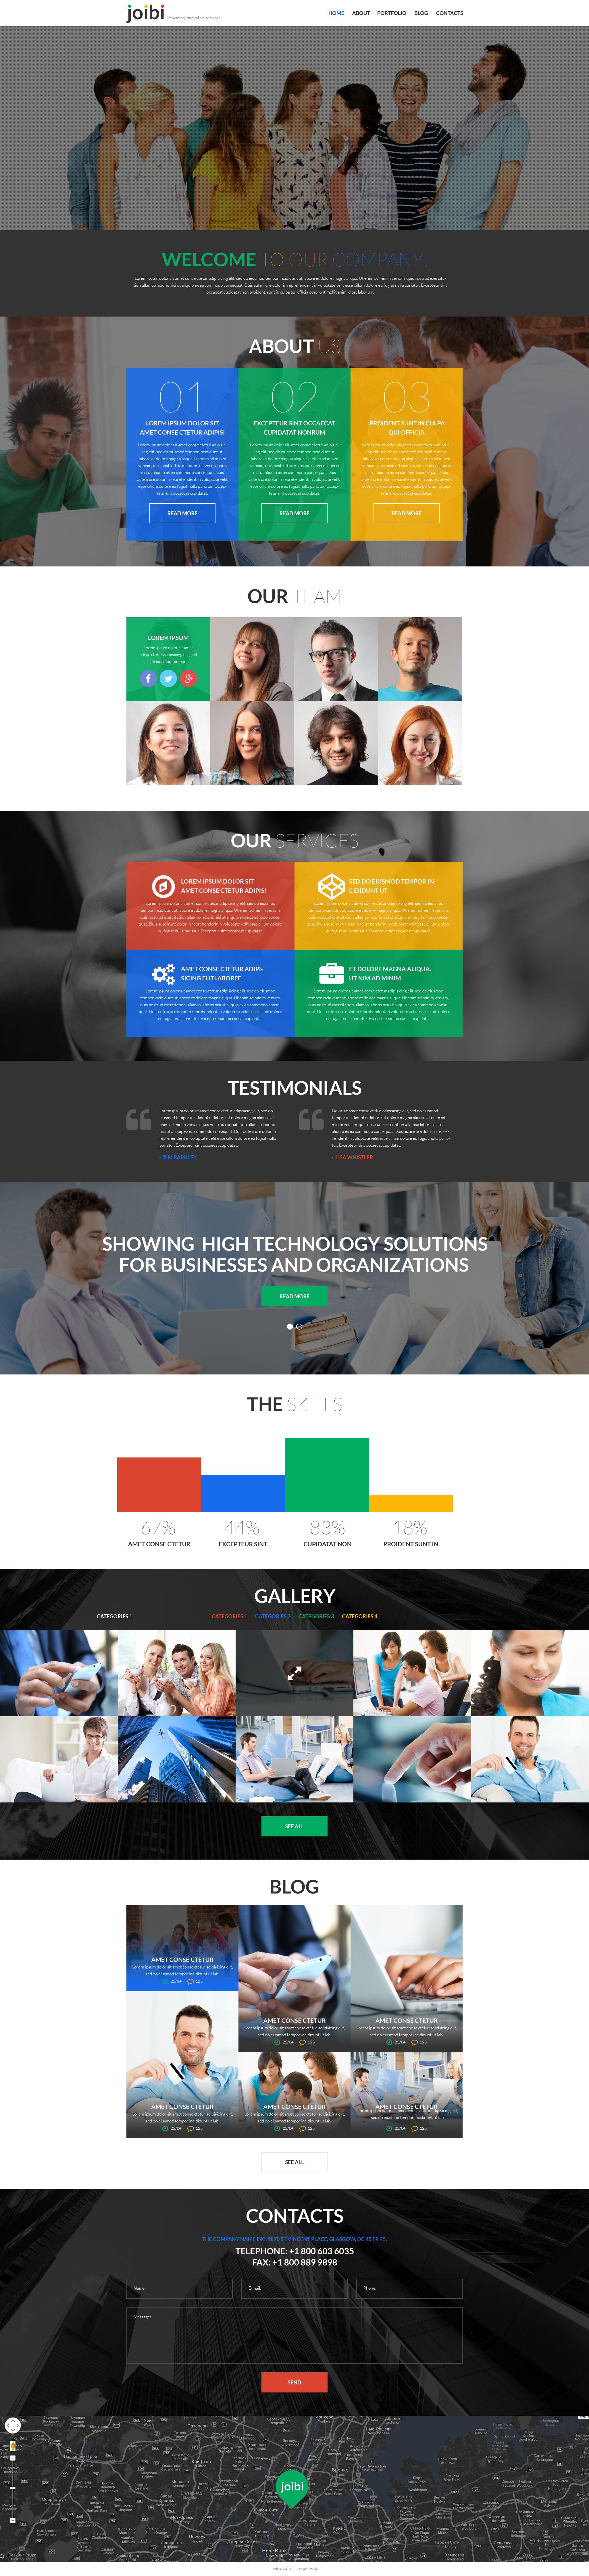 "Modello WordPress Responsive #52442 ""Business Services Promotion"" - screenshot"